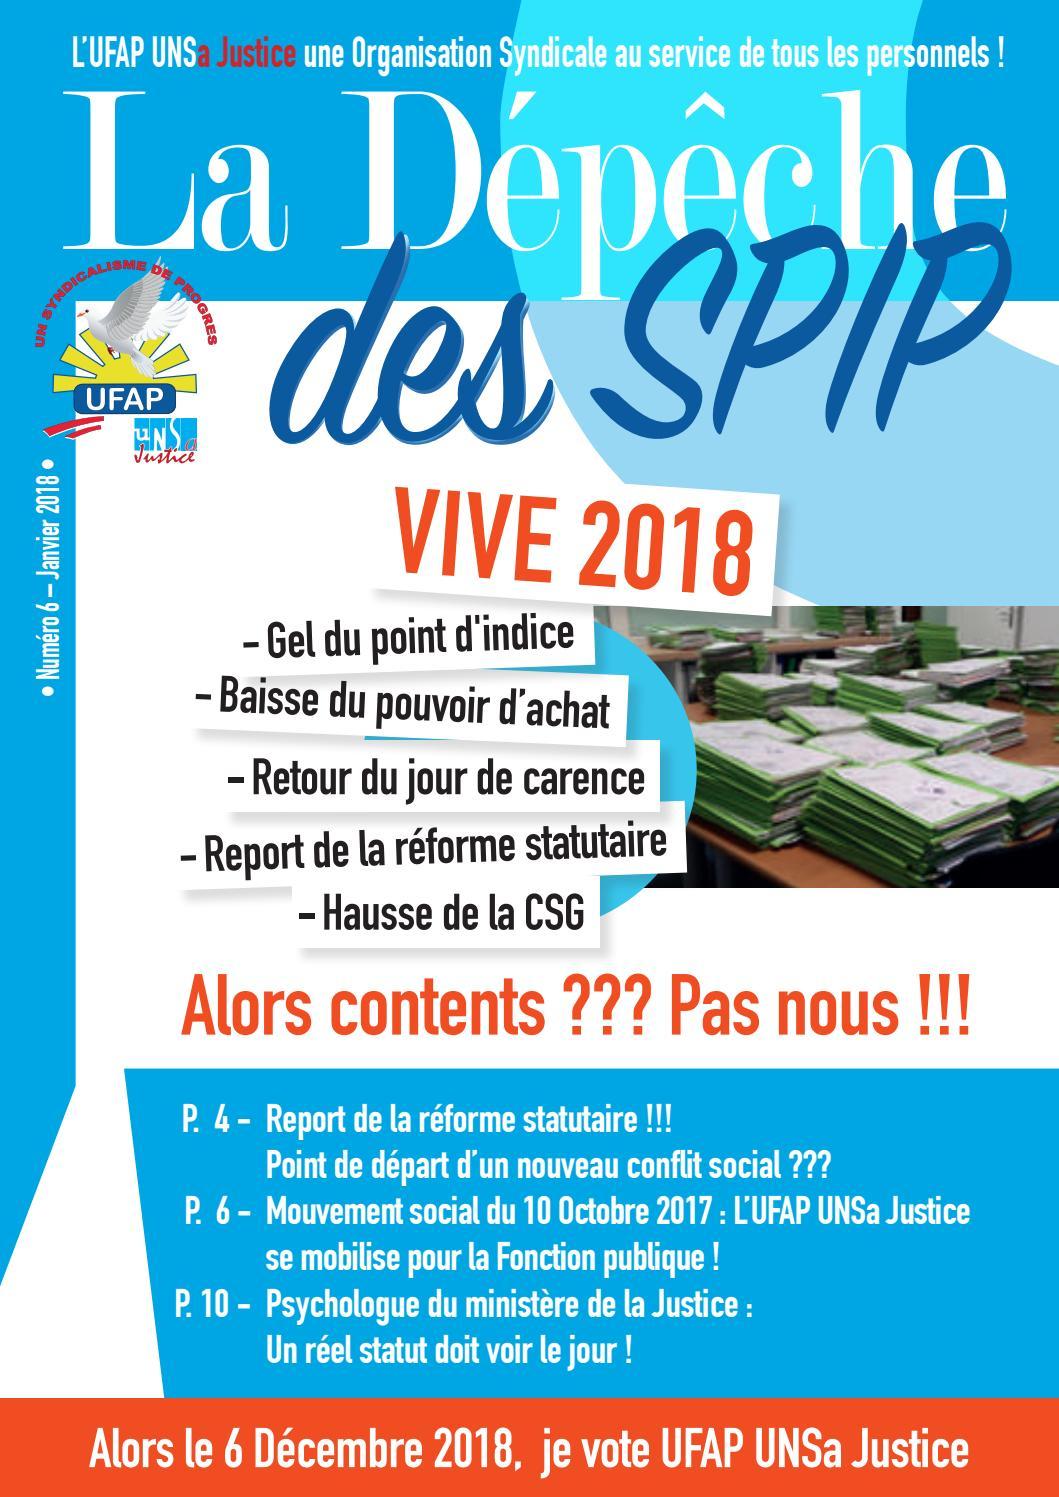 Ufap Calendrier Paye 2022 La depeche des spip n°6 a4(planche) compressed by UFAP UNSa